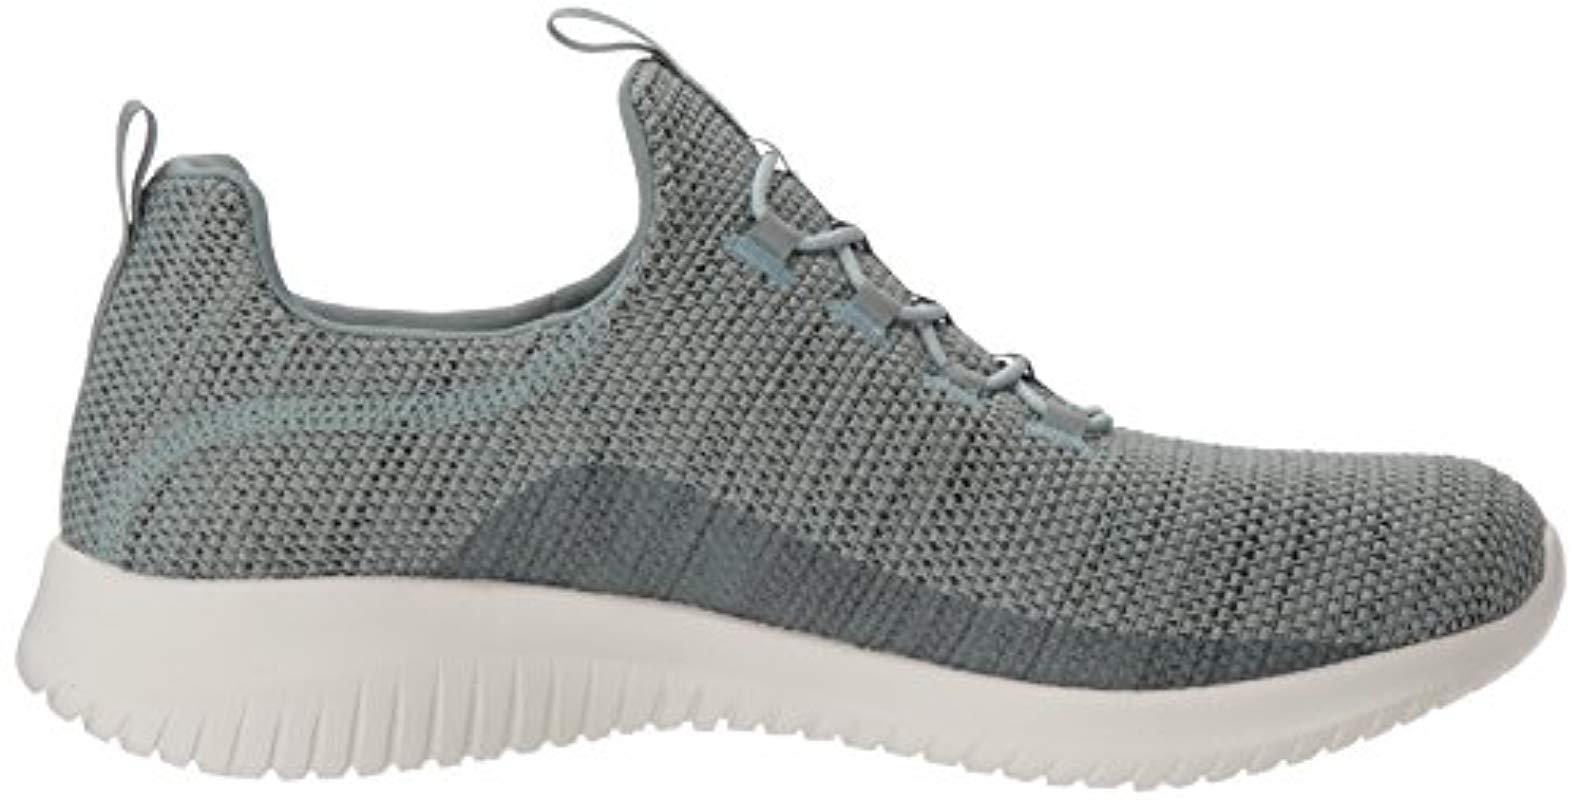 Skechers Ultra Flex Capsule Sneaker in Sage (Grey)